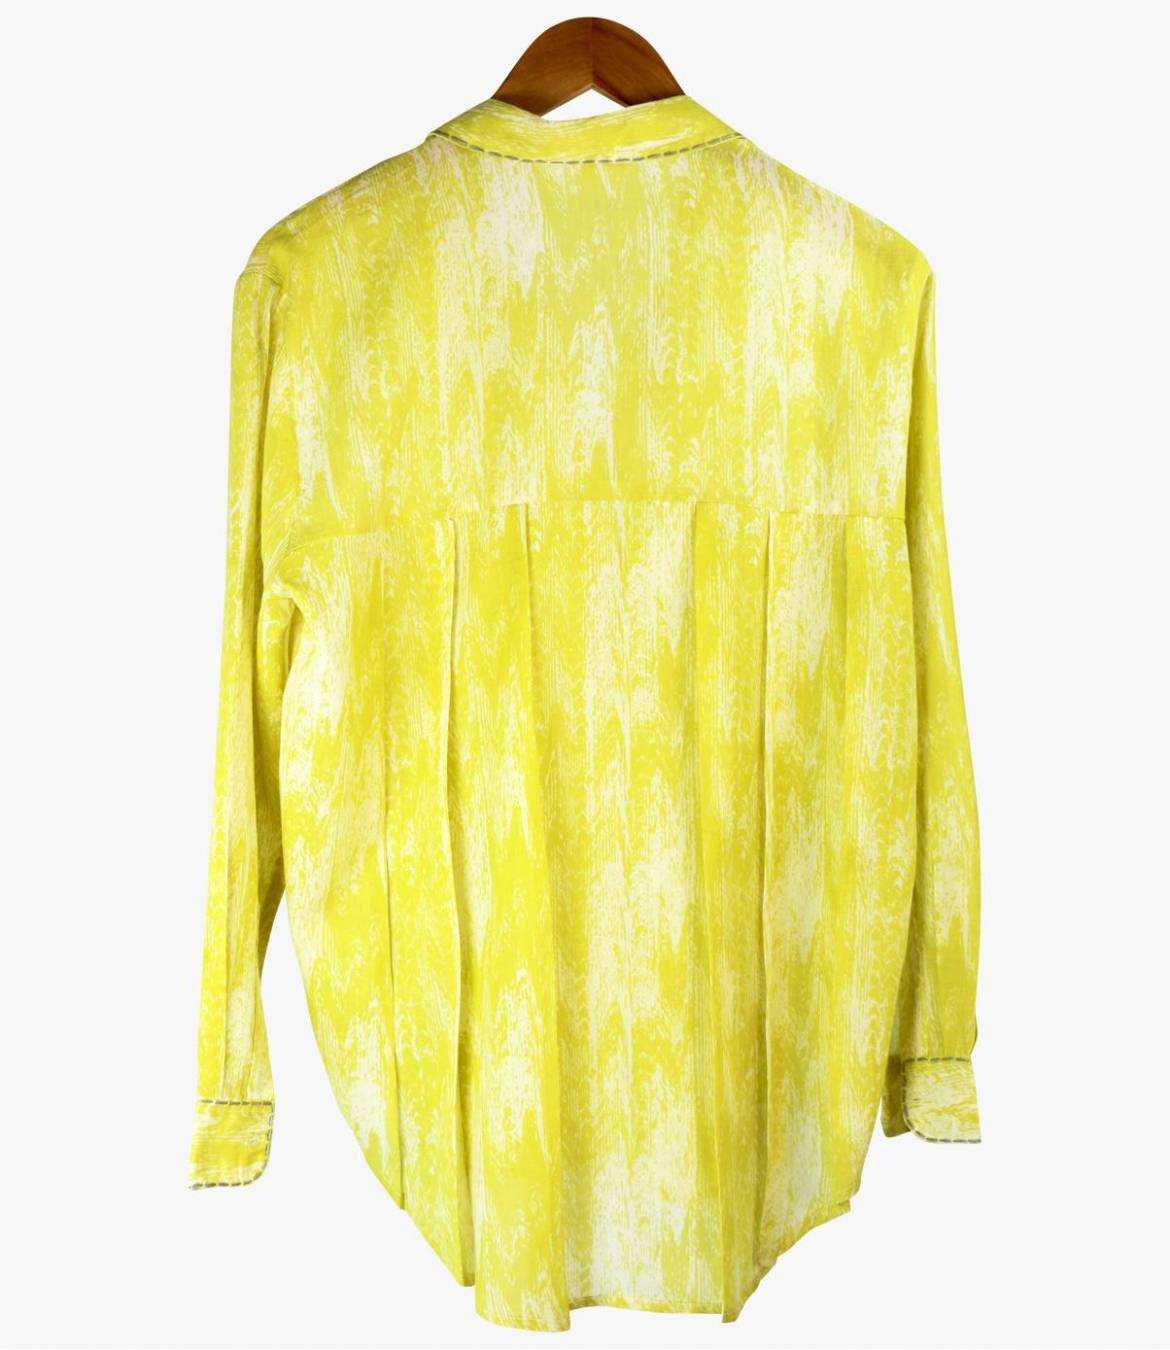 CARI MOIRA Cotton Shirt for Women Storiatipic - 2